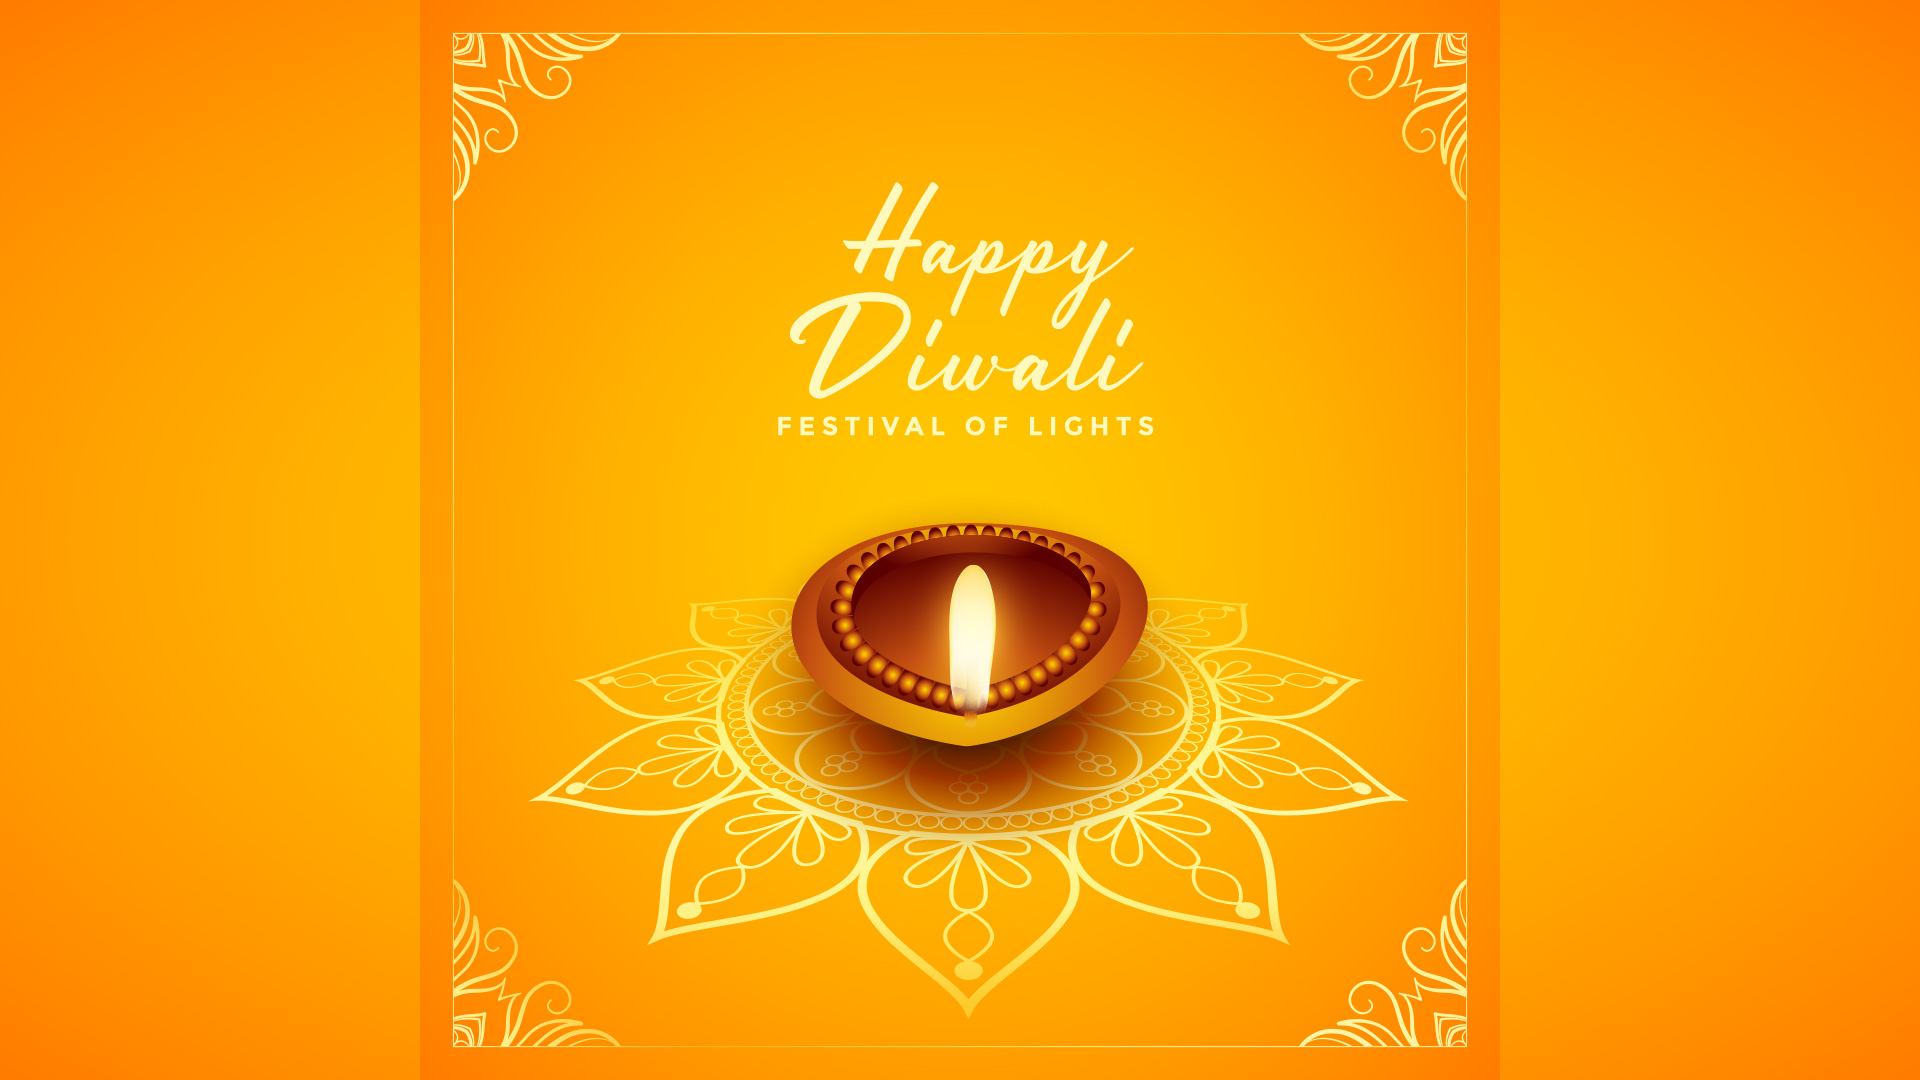 Day 2 Diwali 16 9